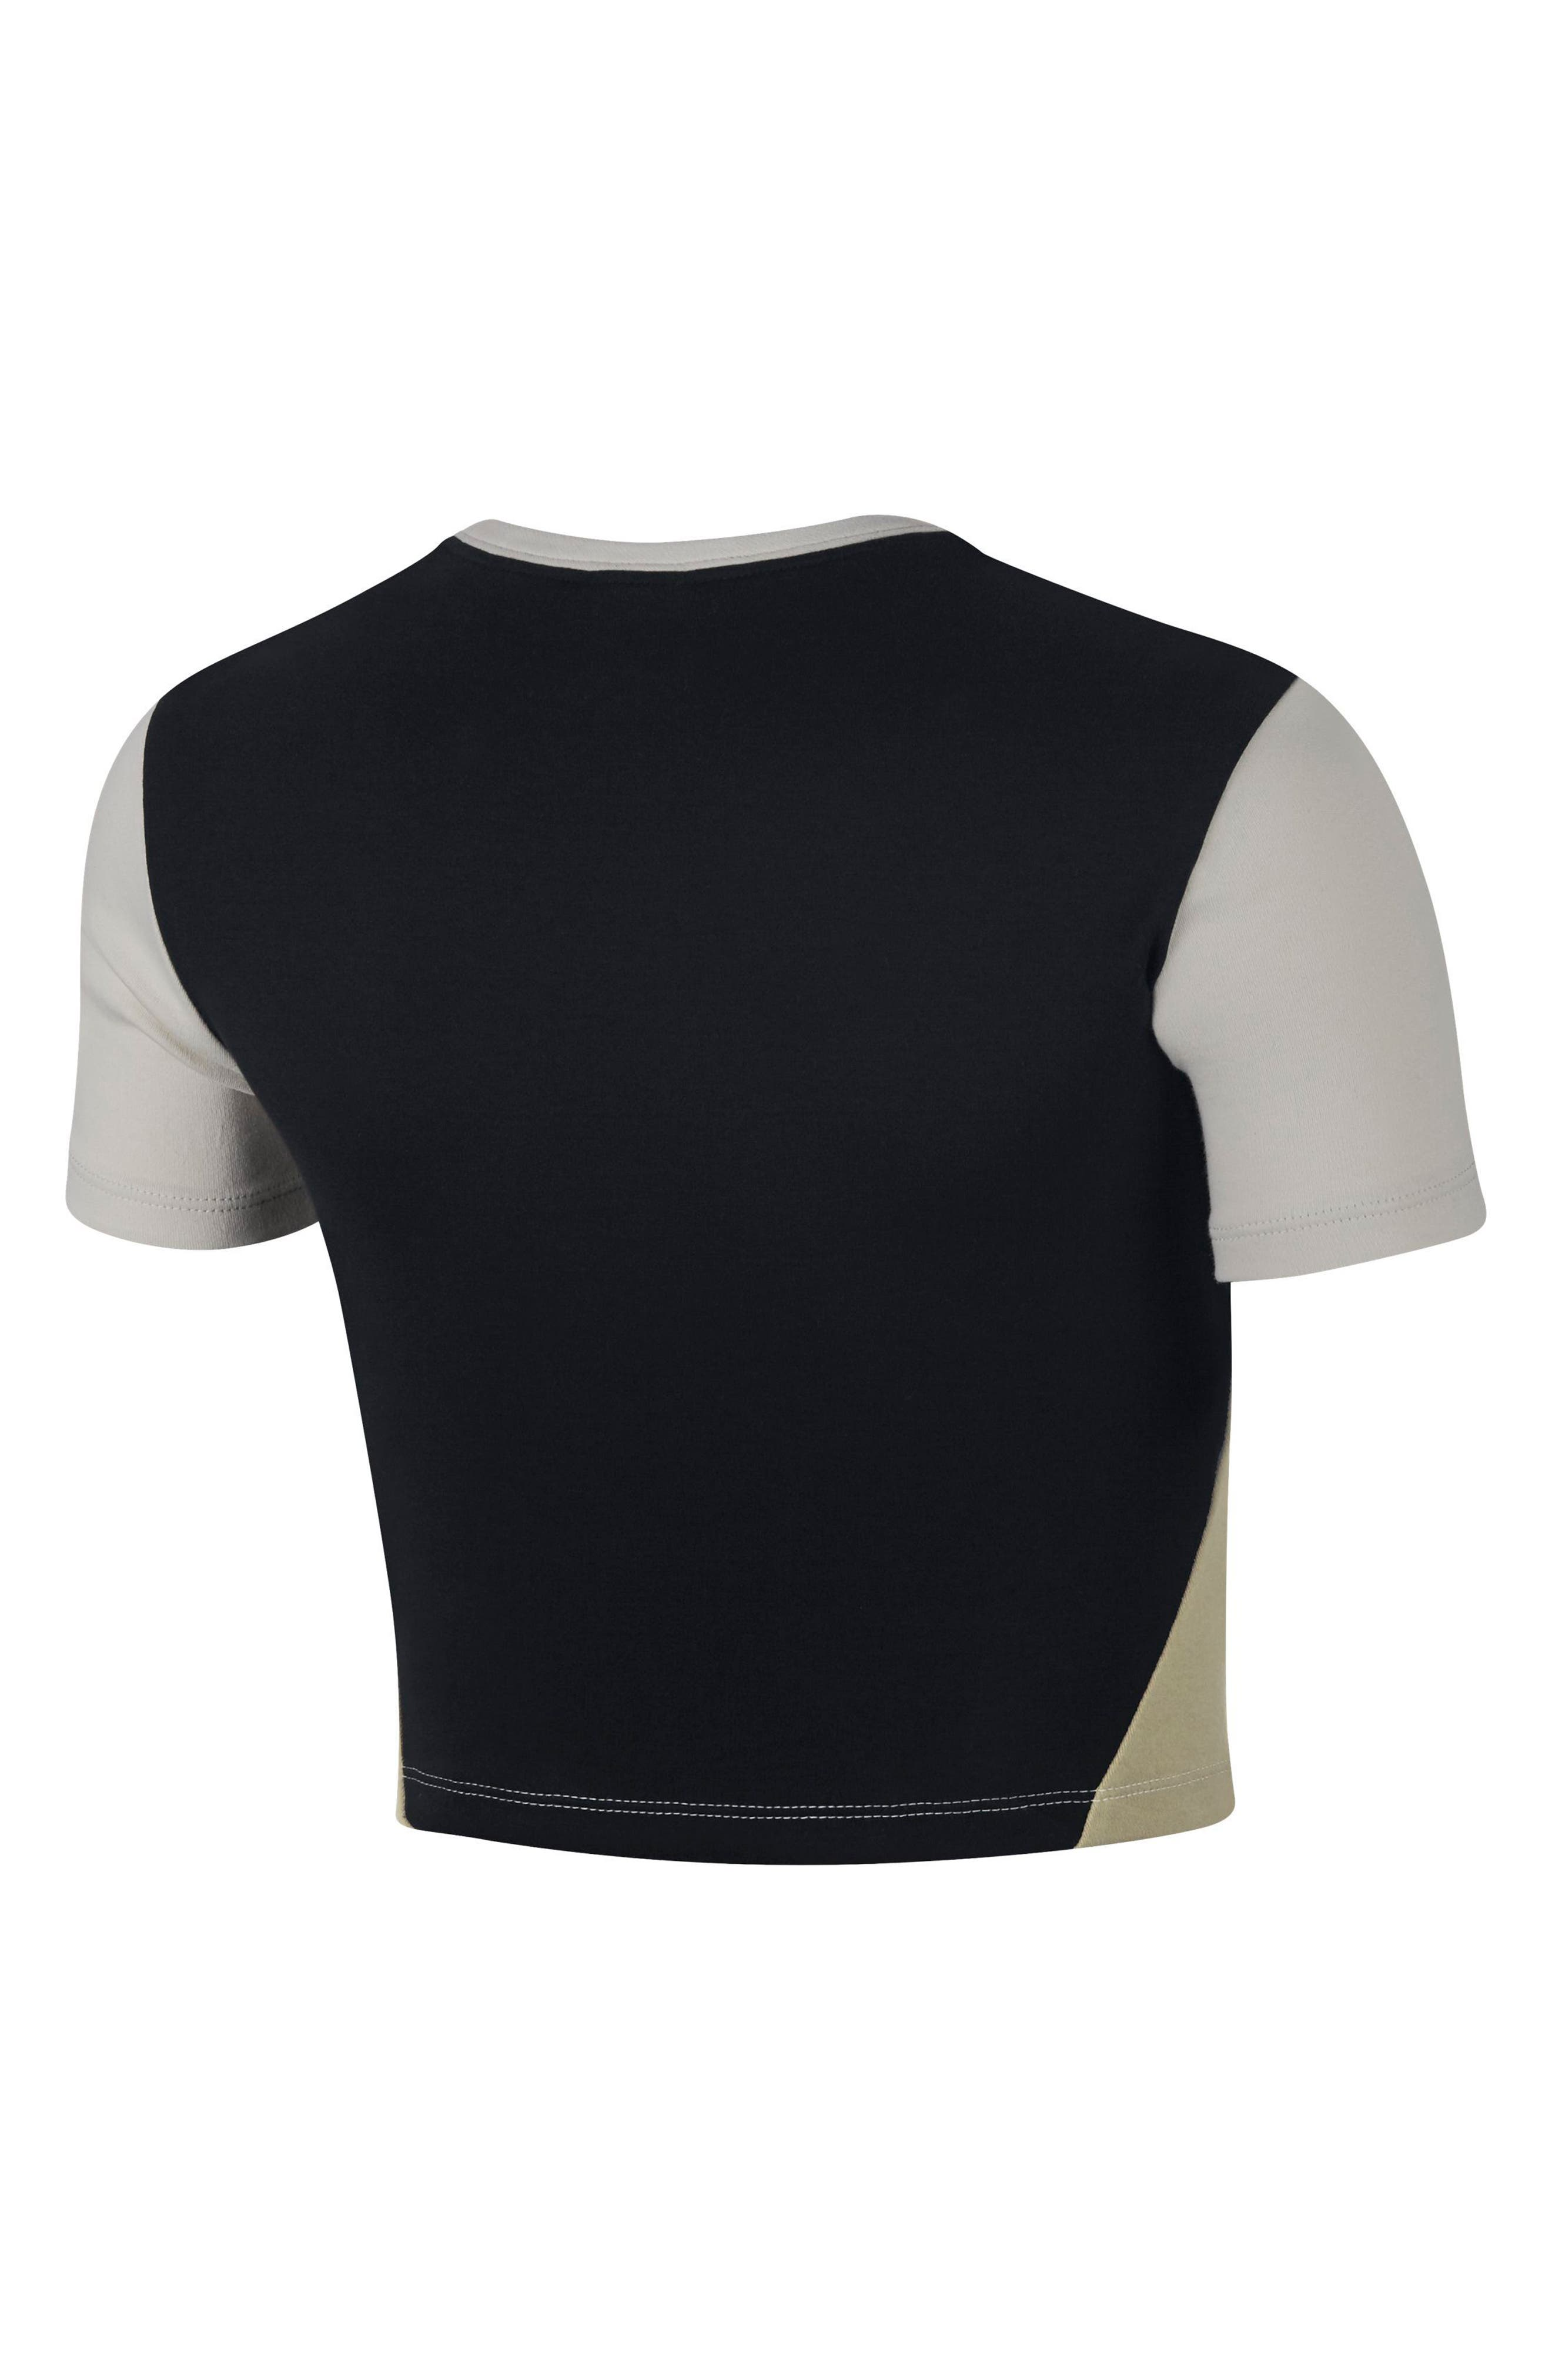 Sportswear Stretch Jersey Crop Top,                             Alternate thumbnail 2, color,                             LIGHT BONE/BLACK/NEUTRAL OLIVE